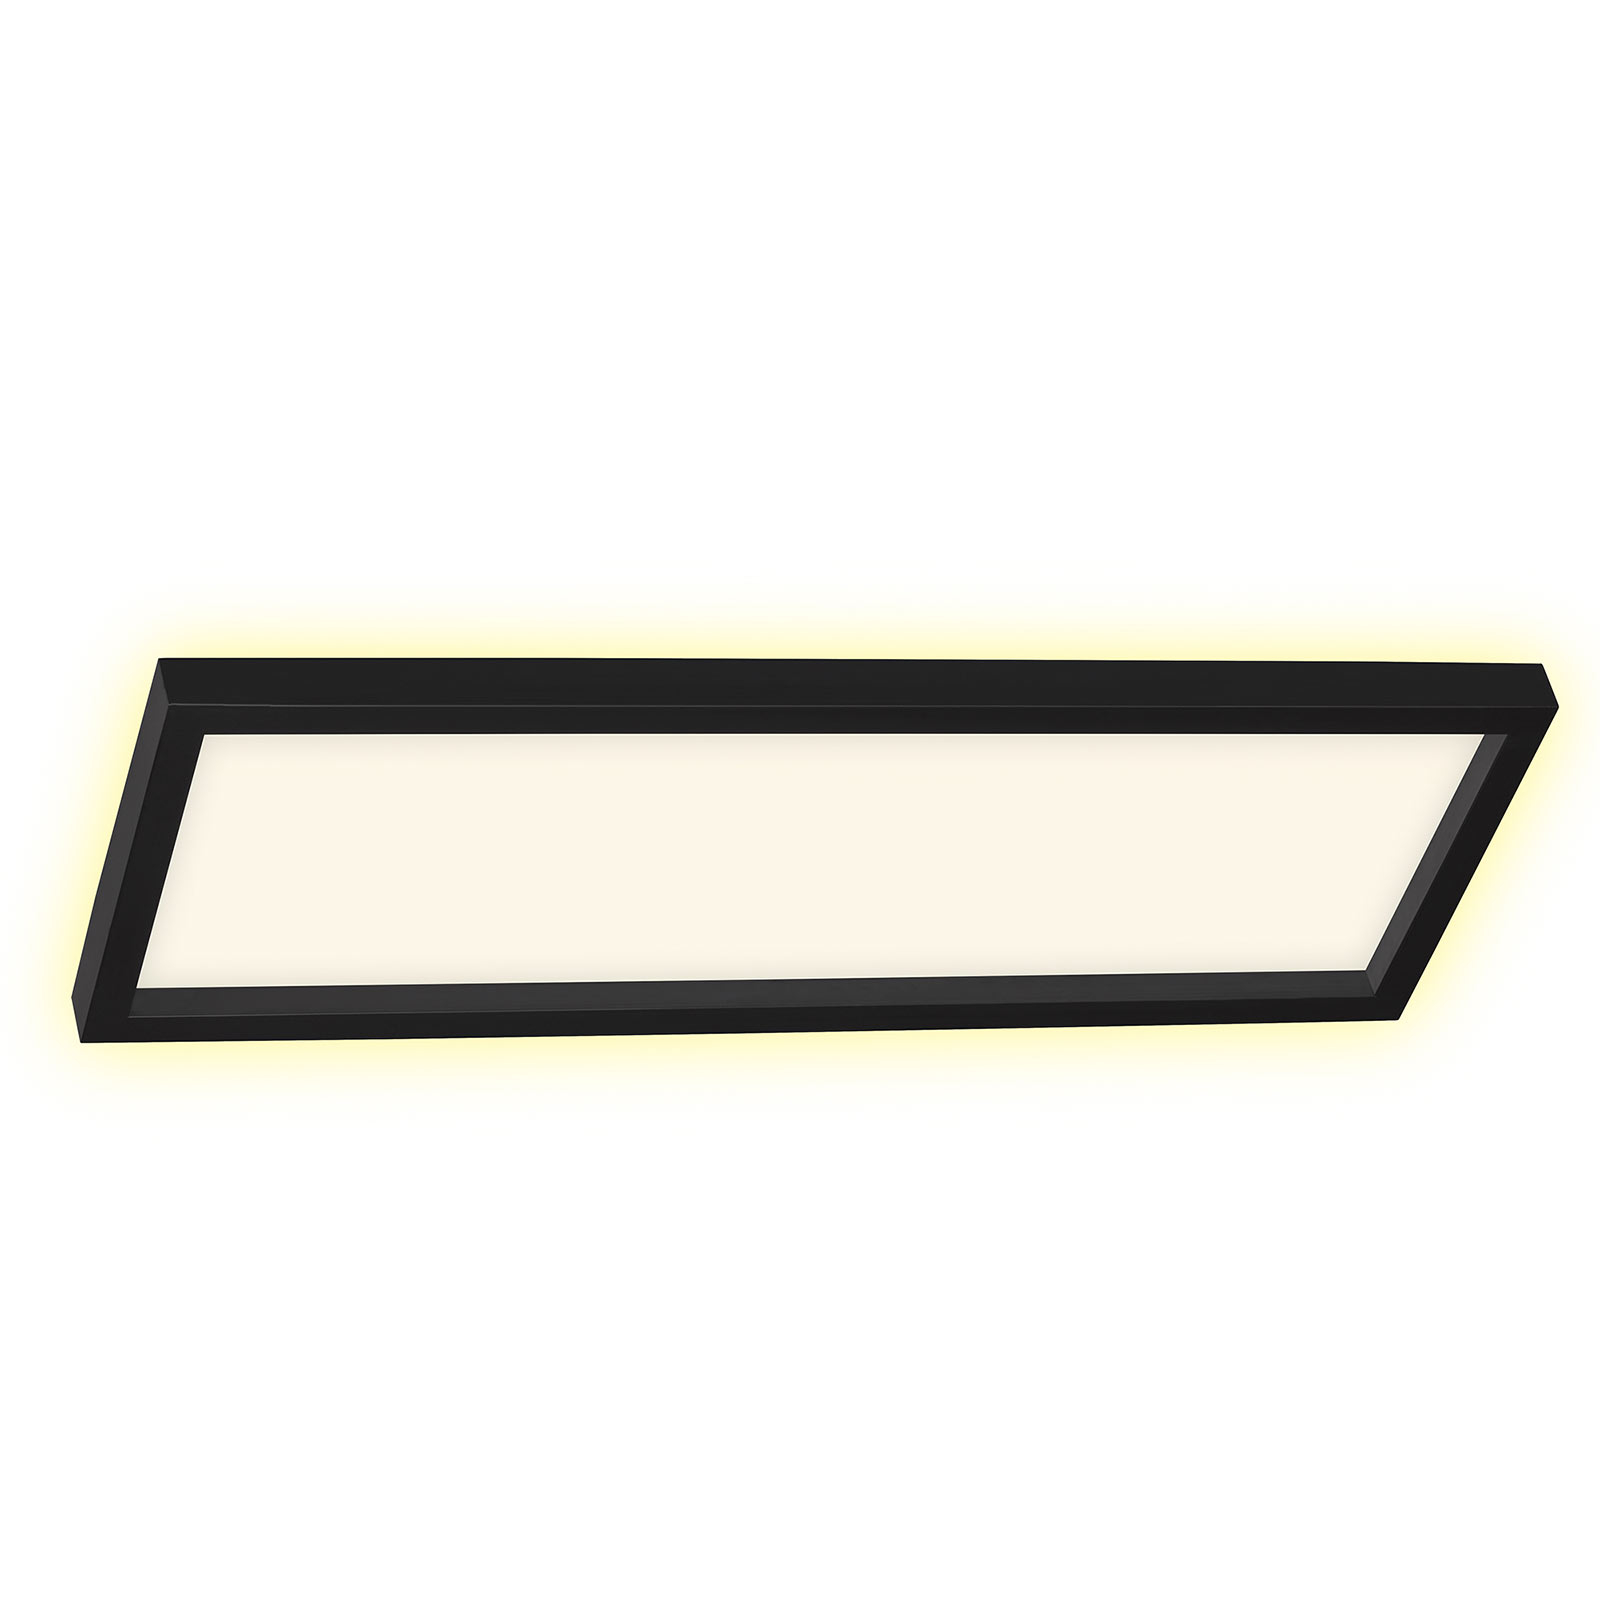 LED-taklampe 7365 58 x 20 cm, svart